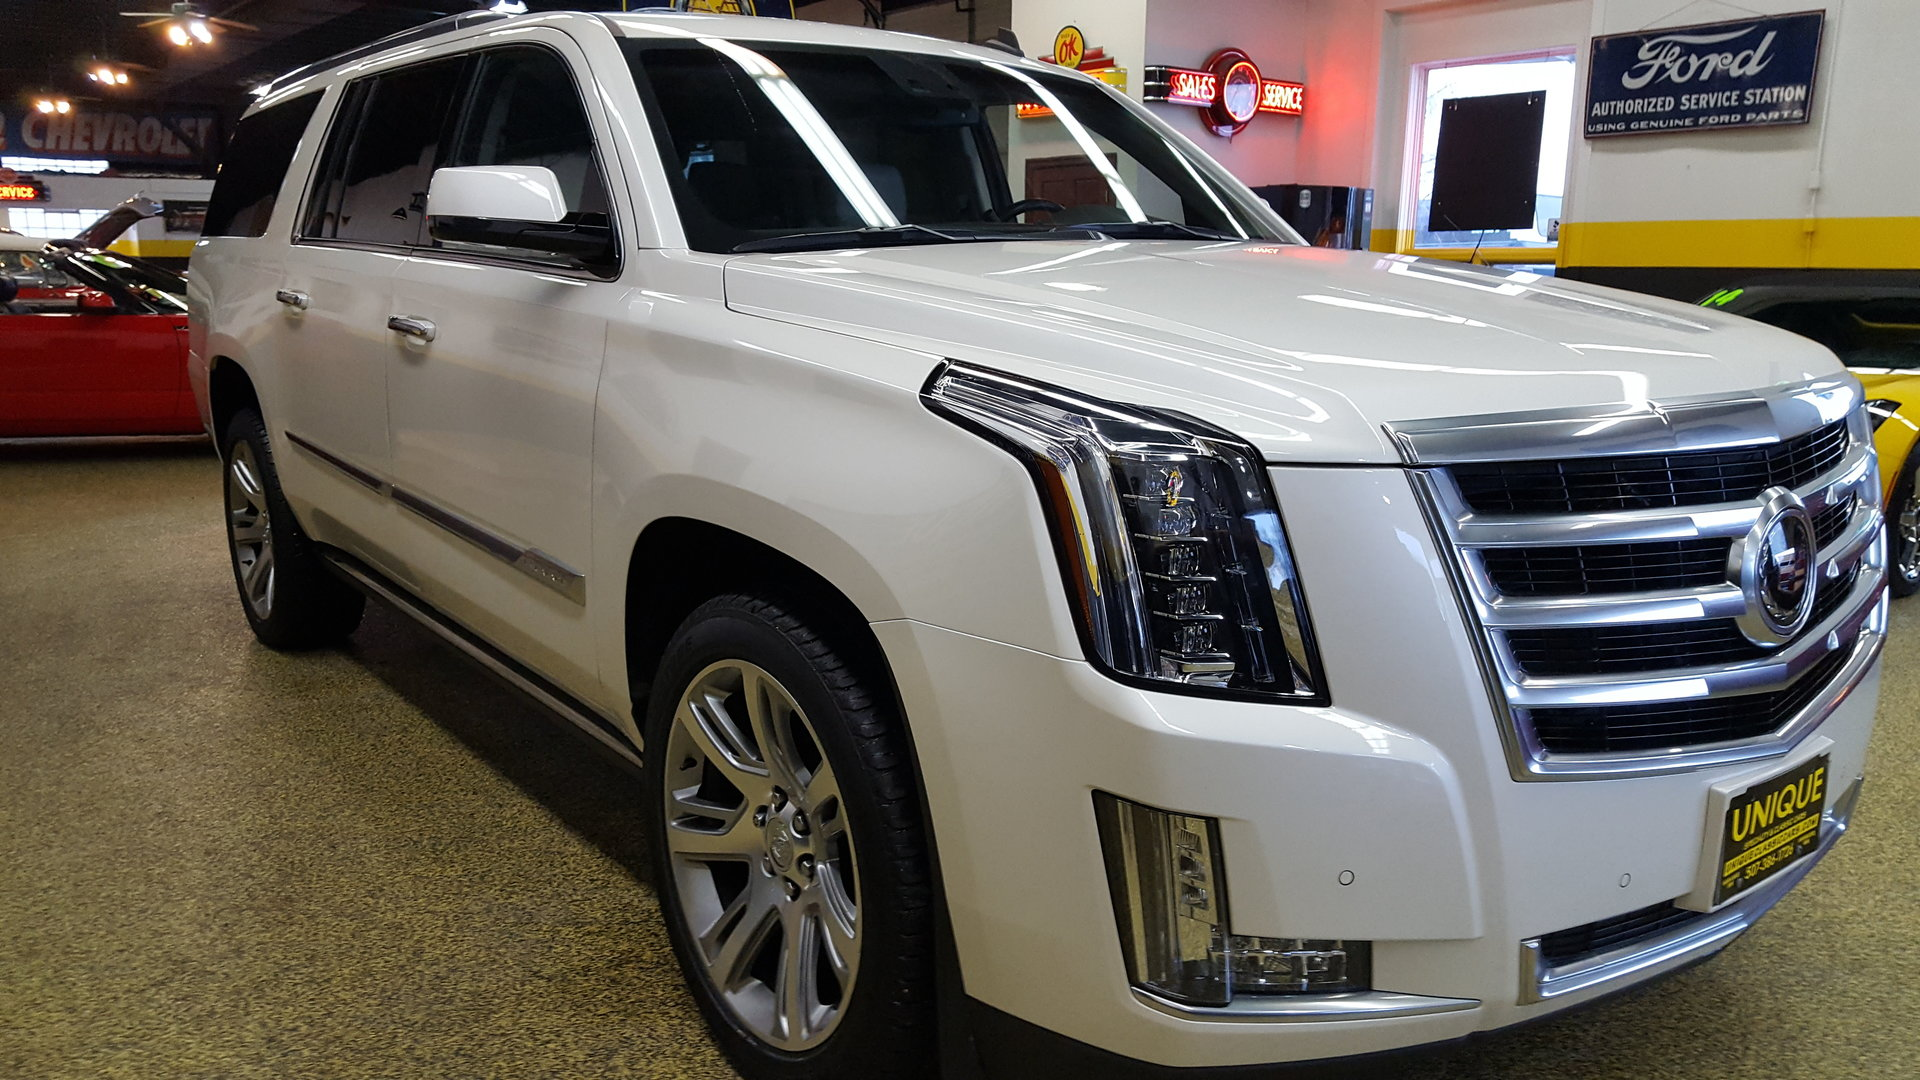 2015 Cadillac Escalade Esv Unique Specialty Classics Gmc Back Zoom Icon Show Pictures